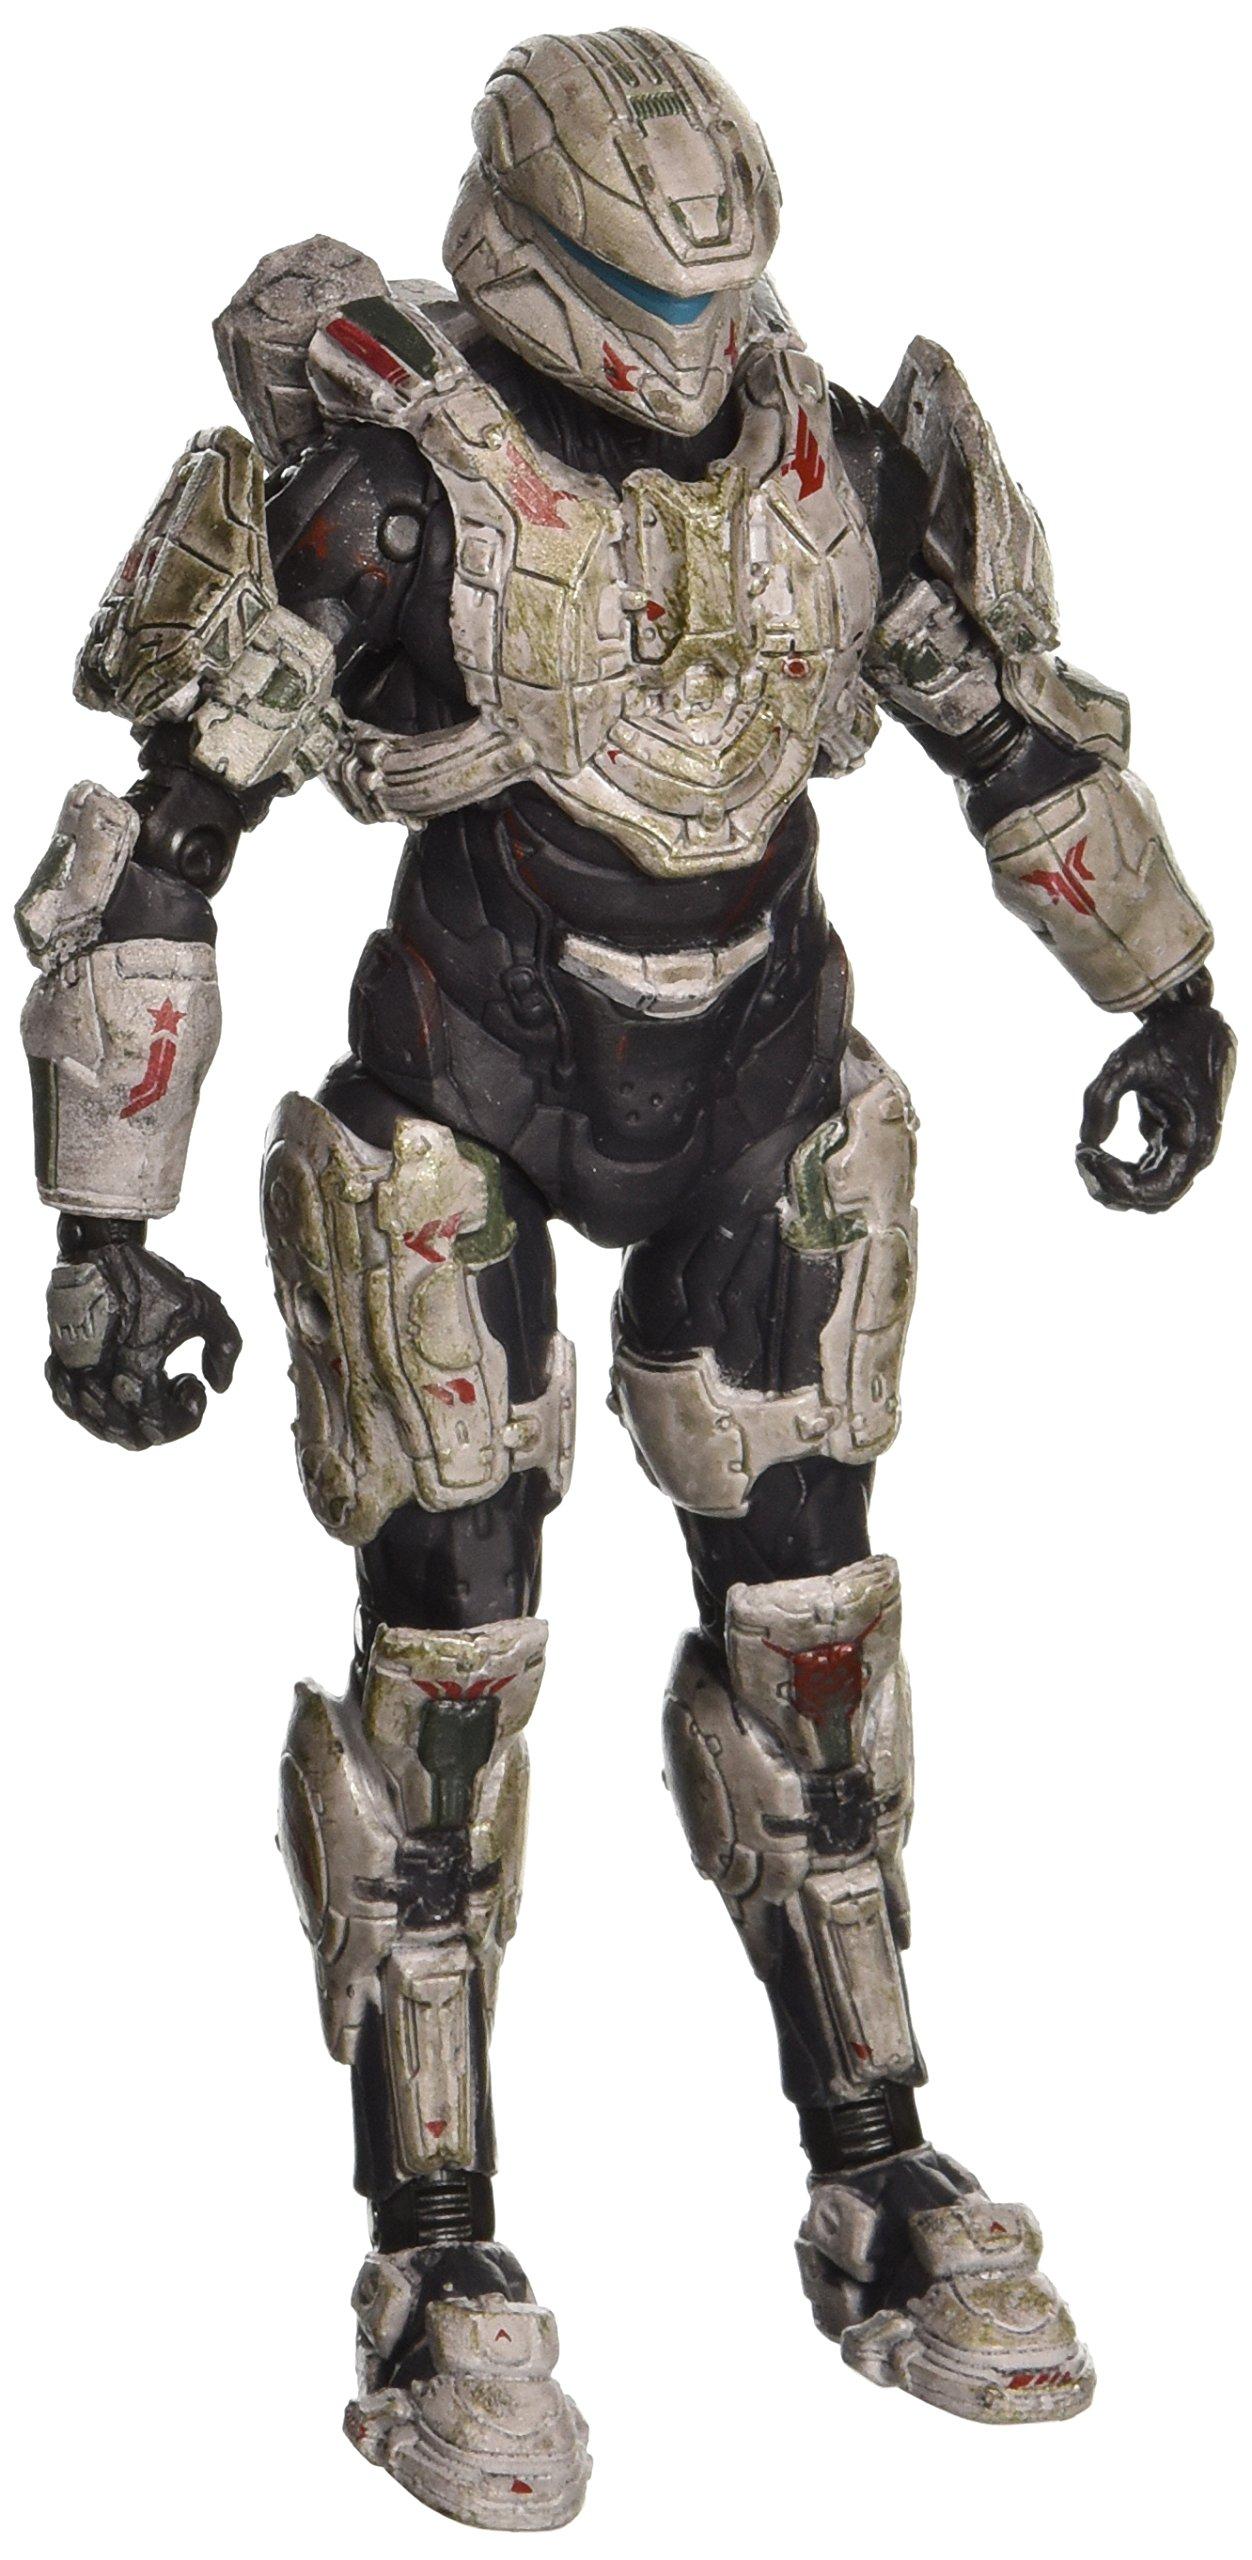 McFarlane Toys Halo 4 Series 3 Commander Palmer Action Figure